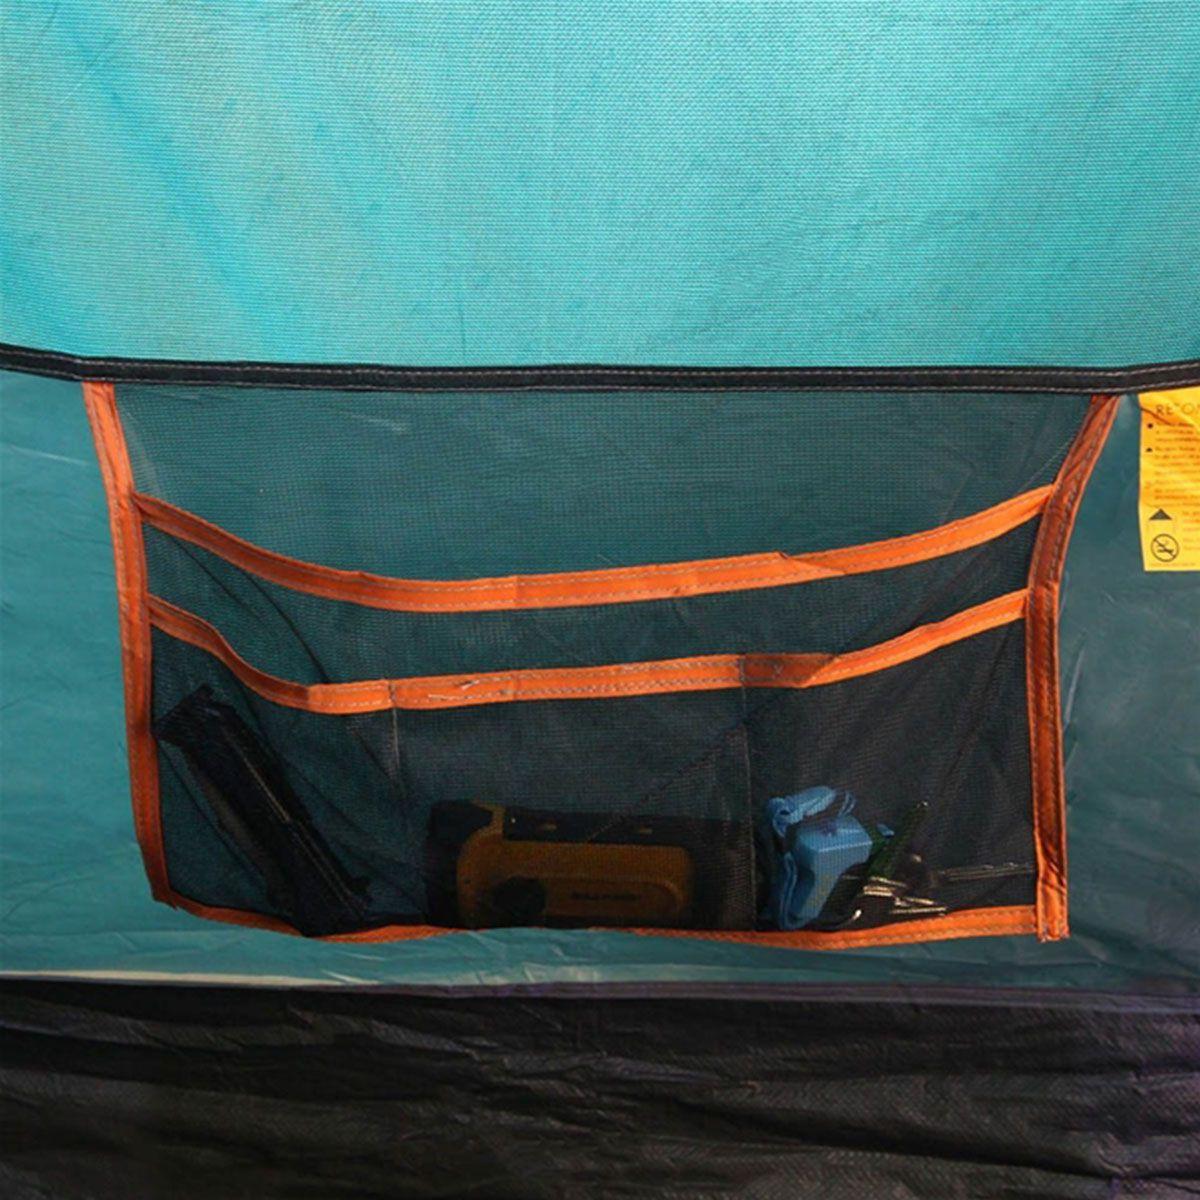 Barraca de Camping Nautika Iindy 2/3 Pessoas Nylon